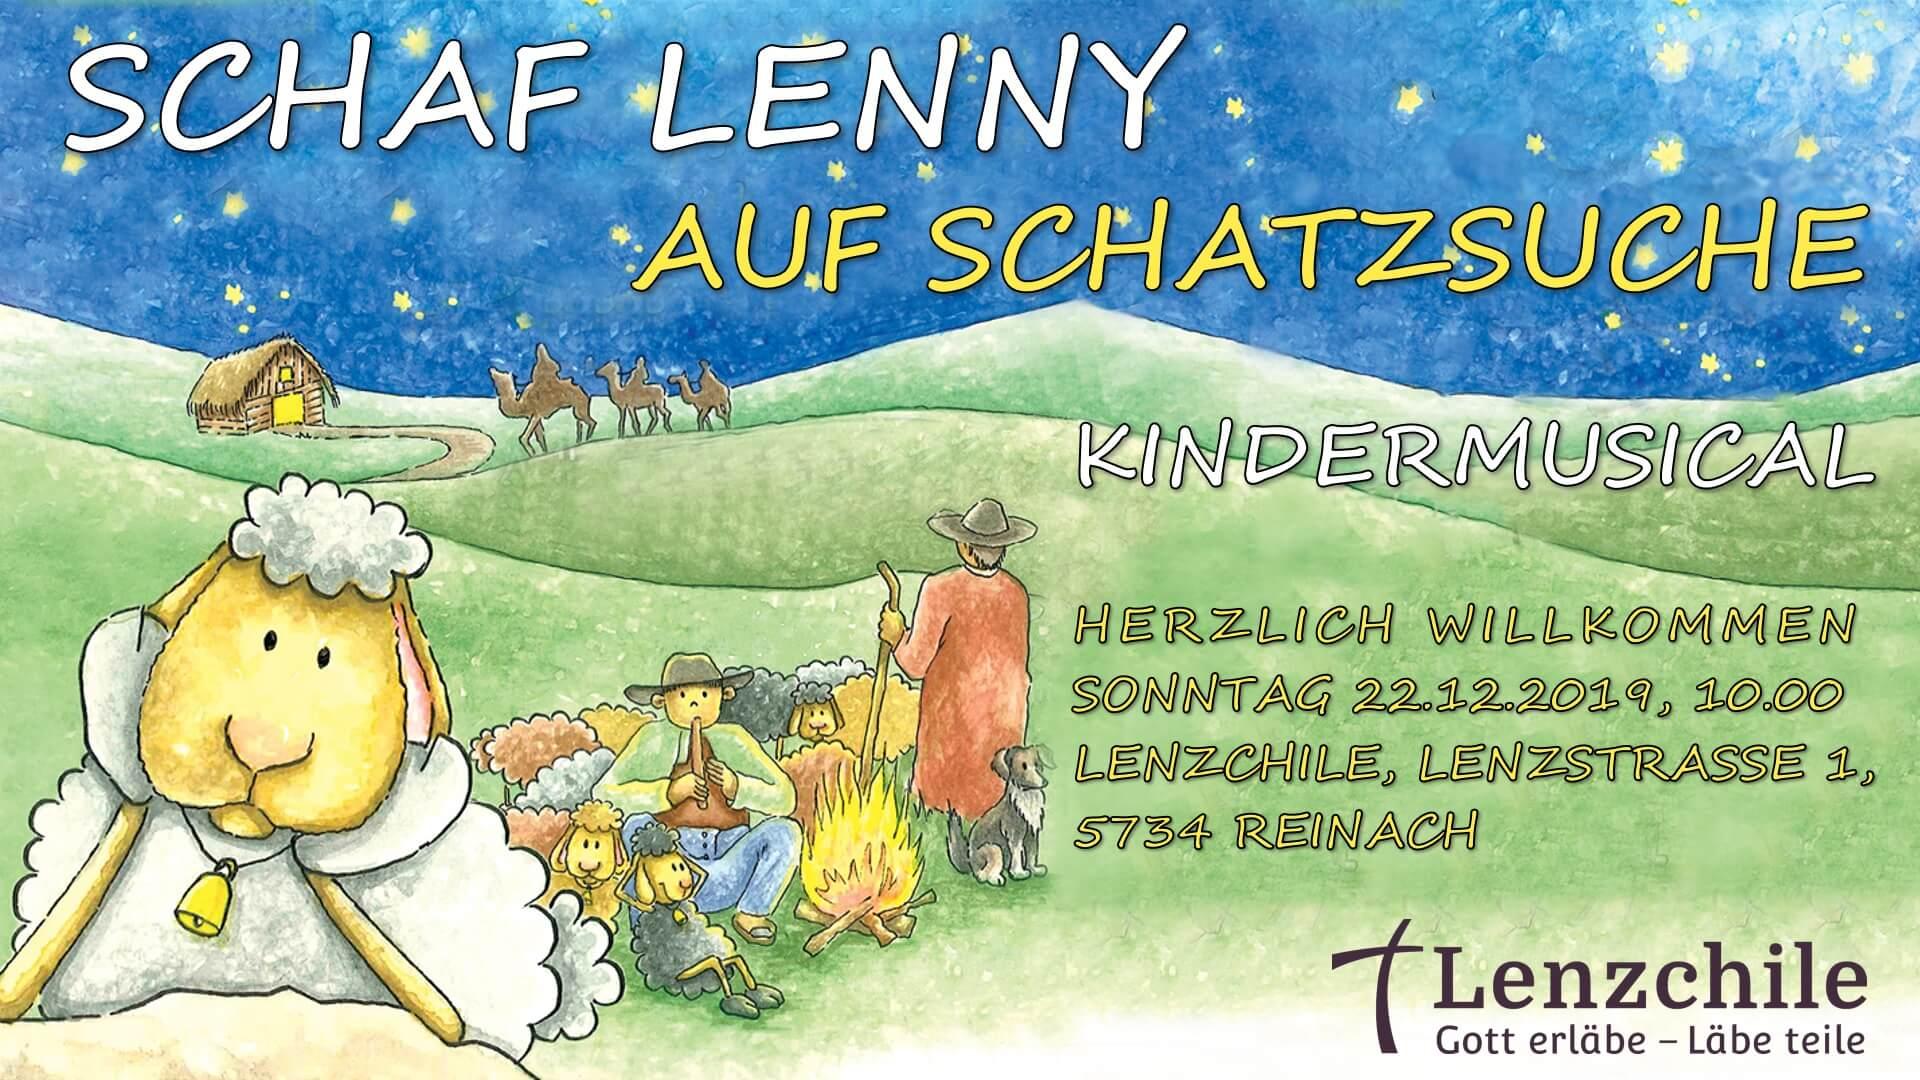 19-12-22 flyer kt musical